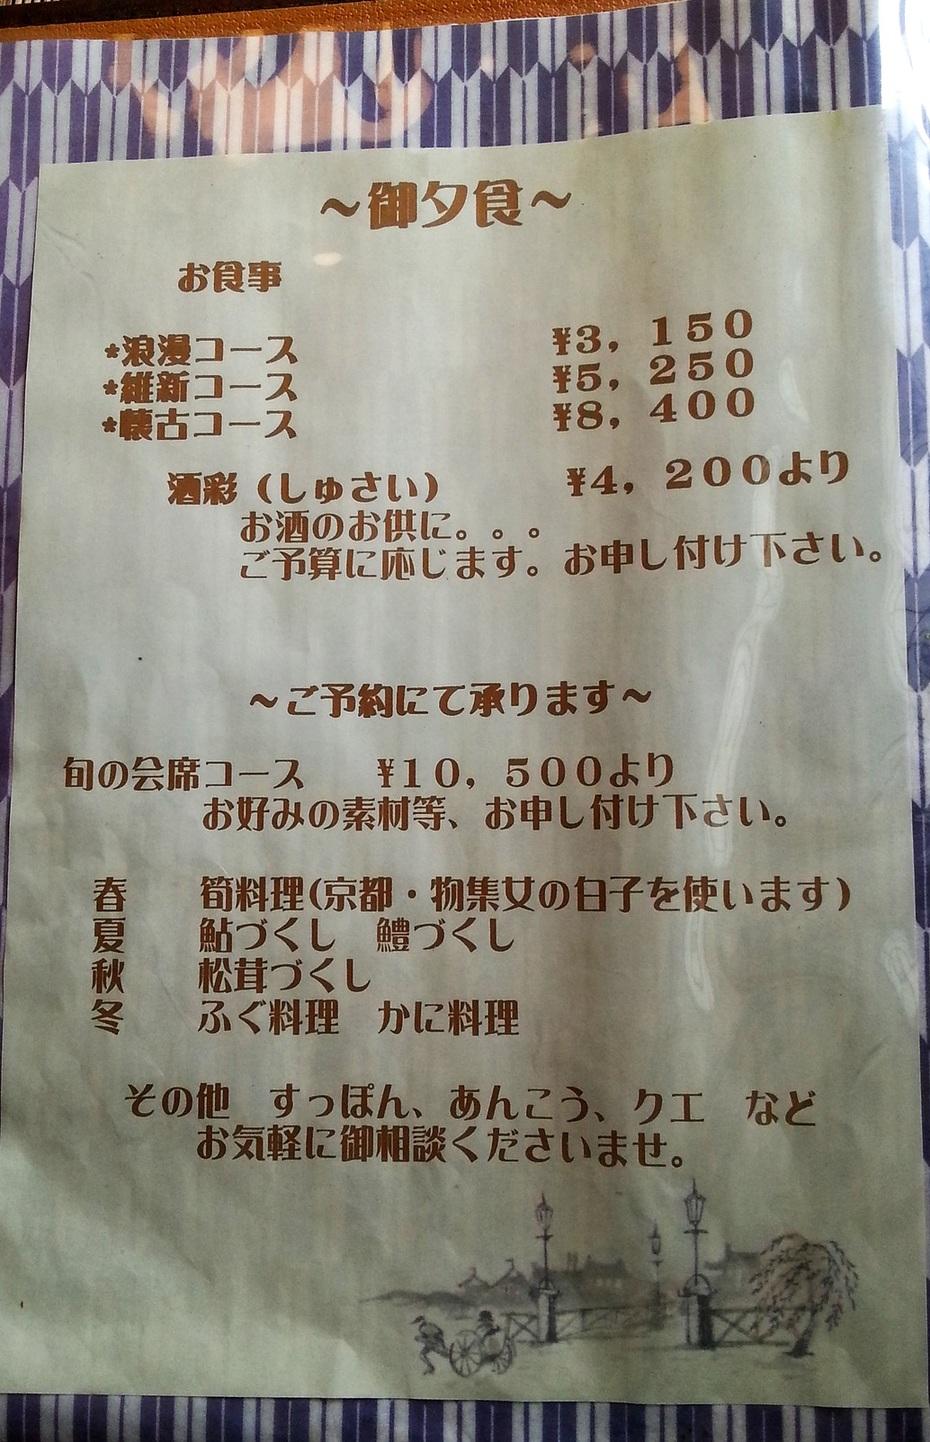 伊織 name=